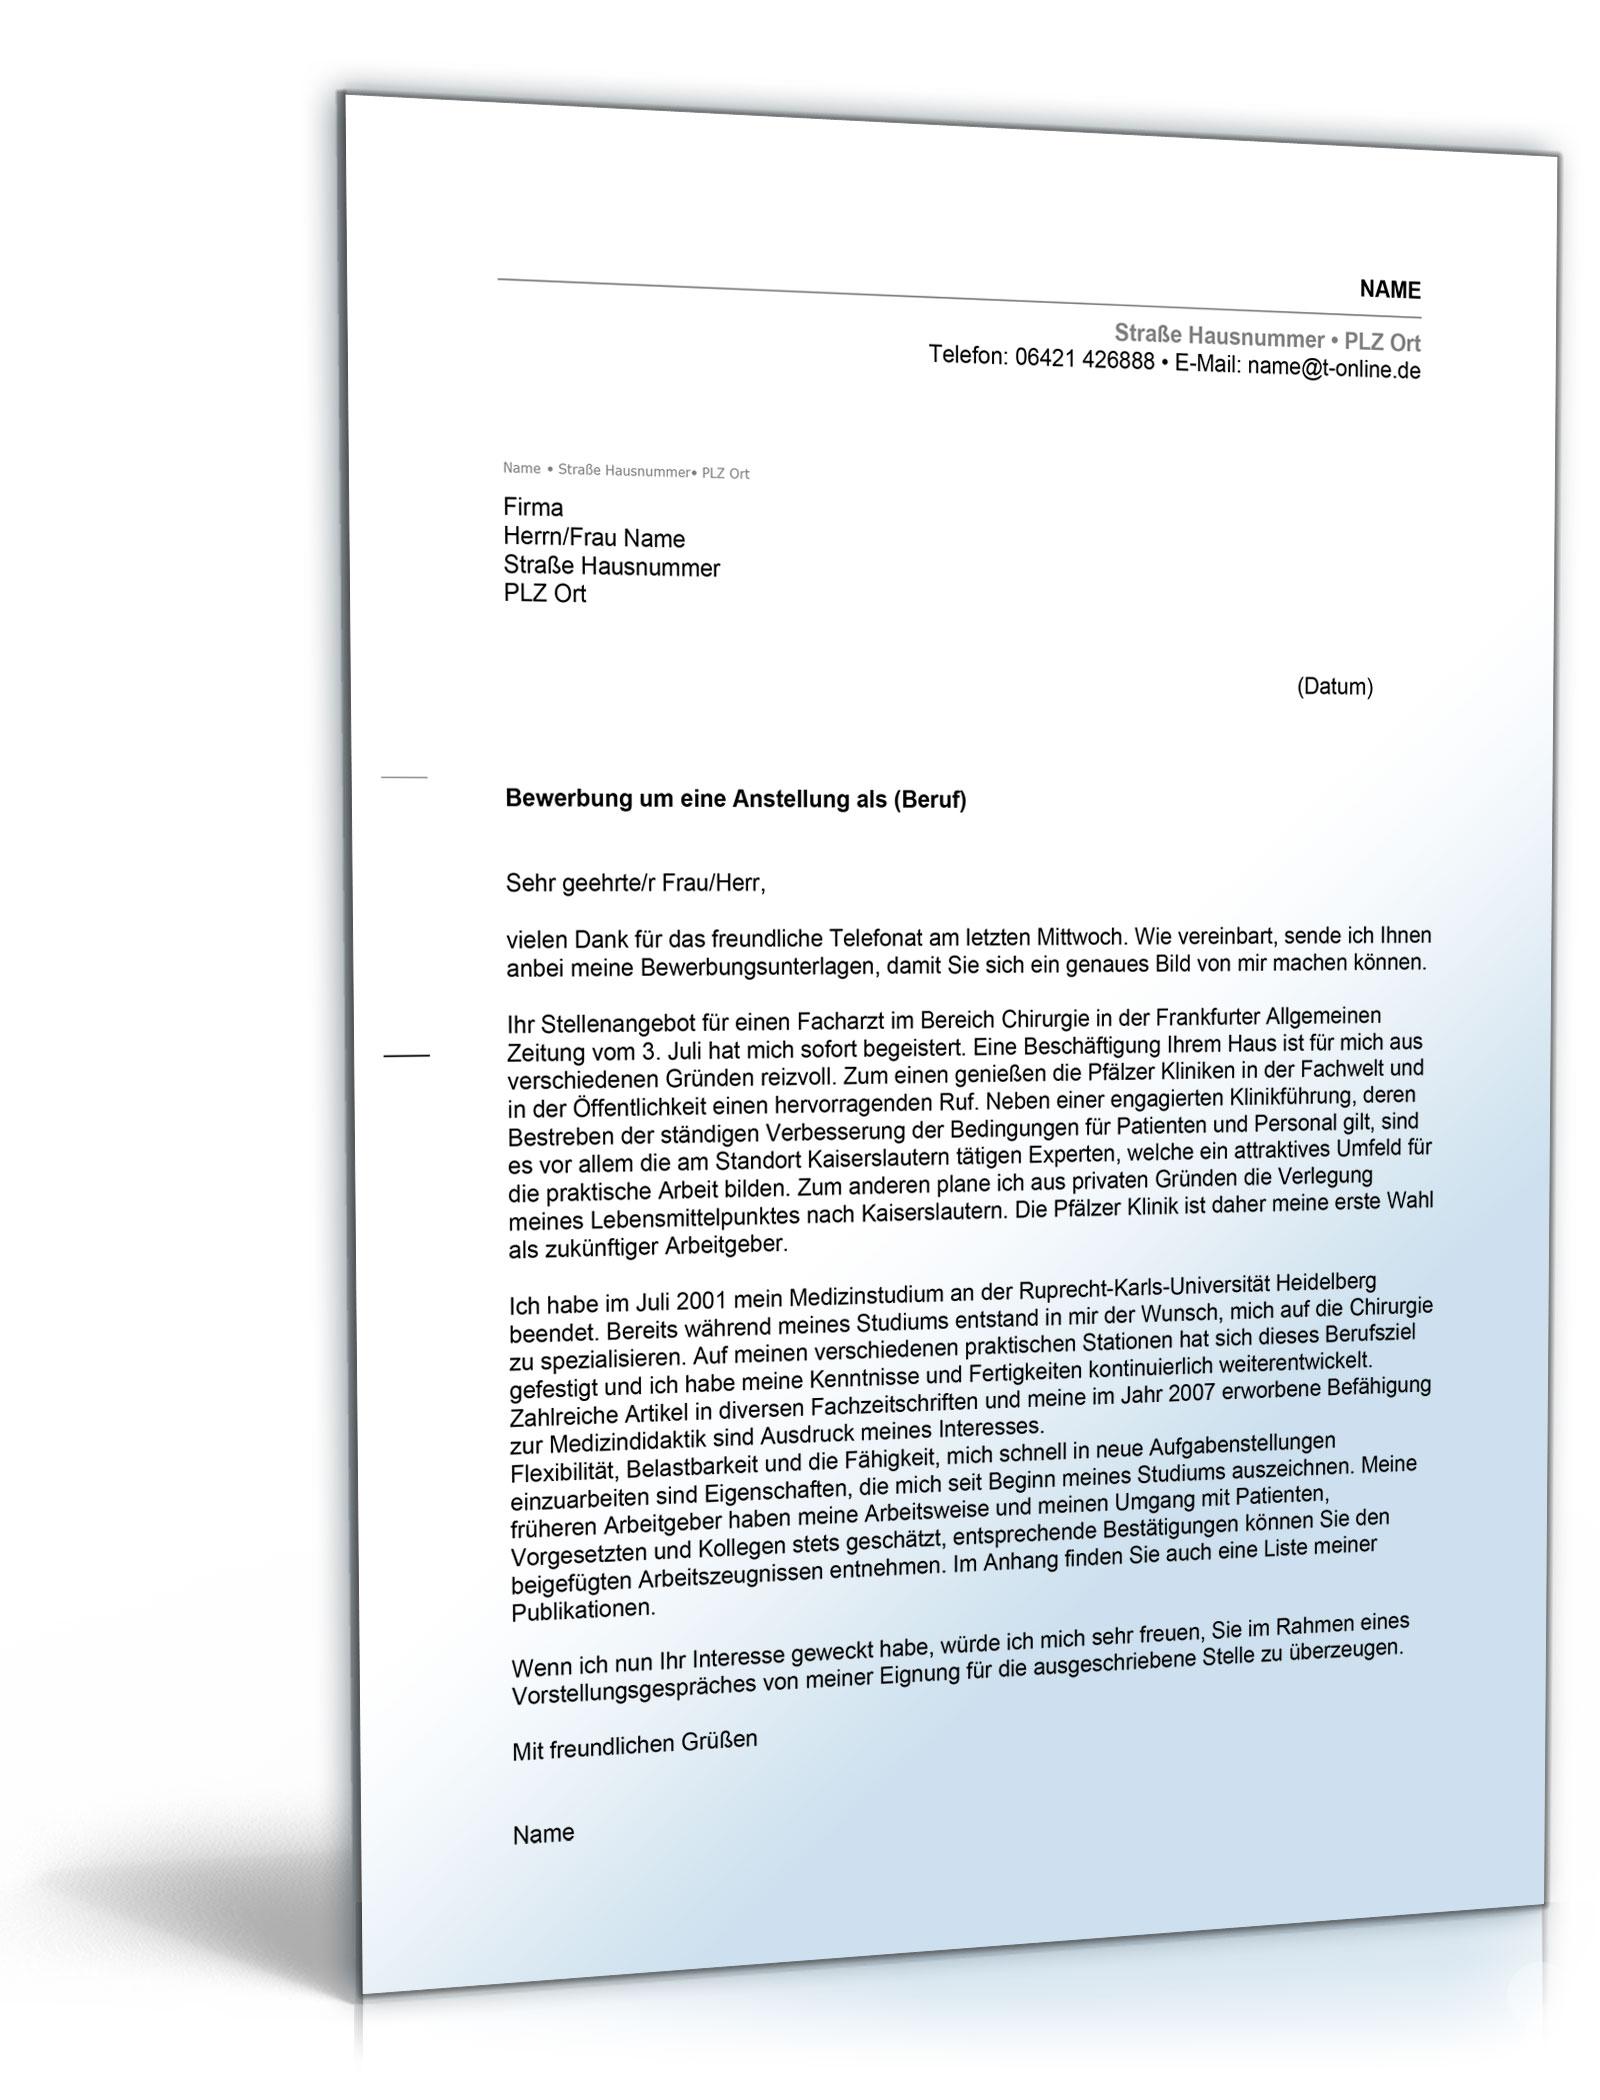 anschreiben bewerbung arzt word dokument download amazonde software - Anschreiben Fr Initiativbewerbung